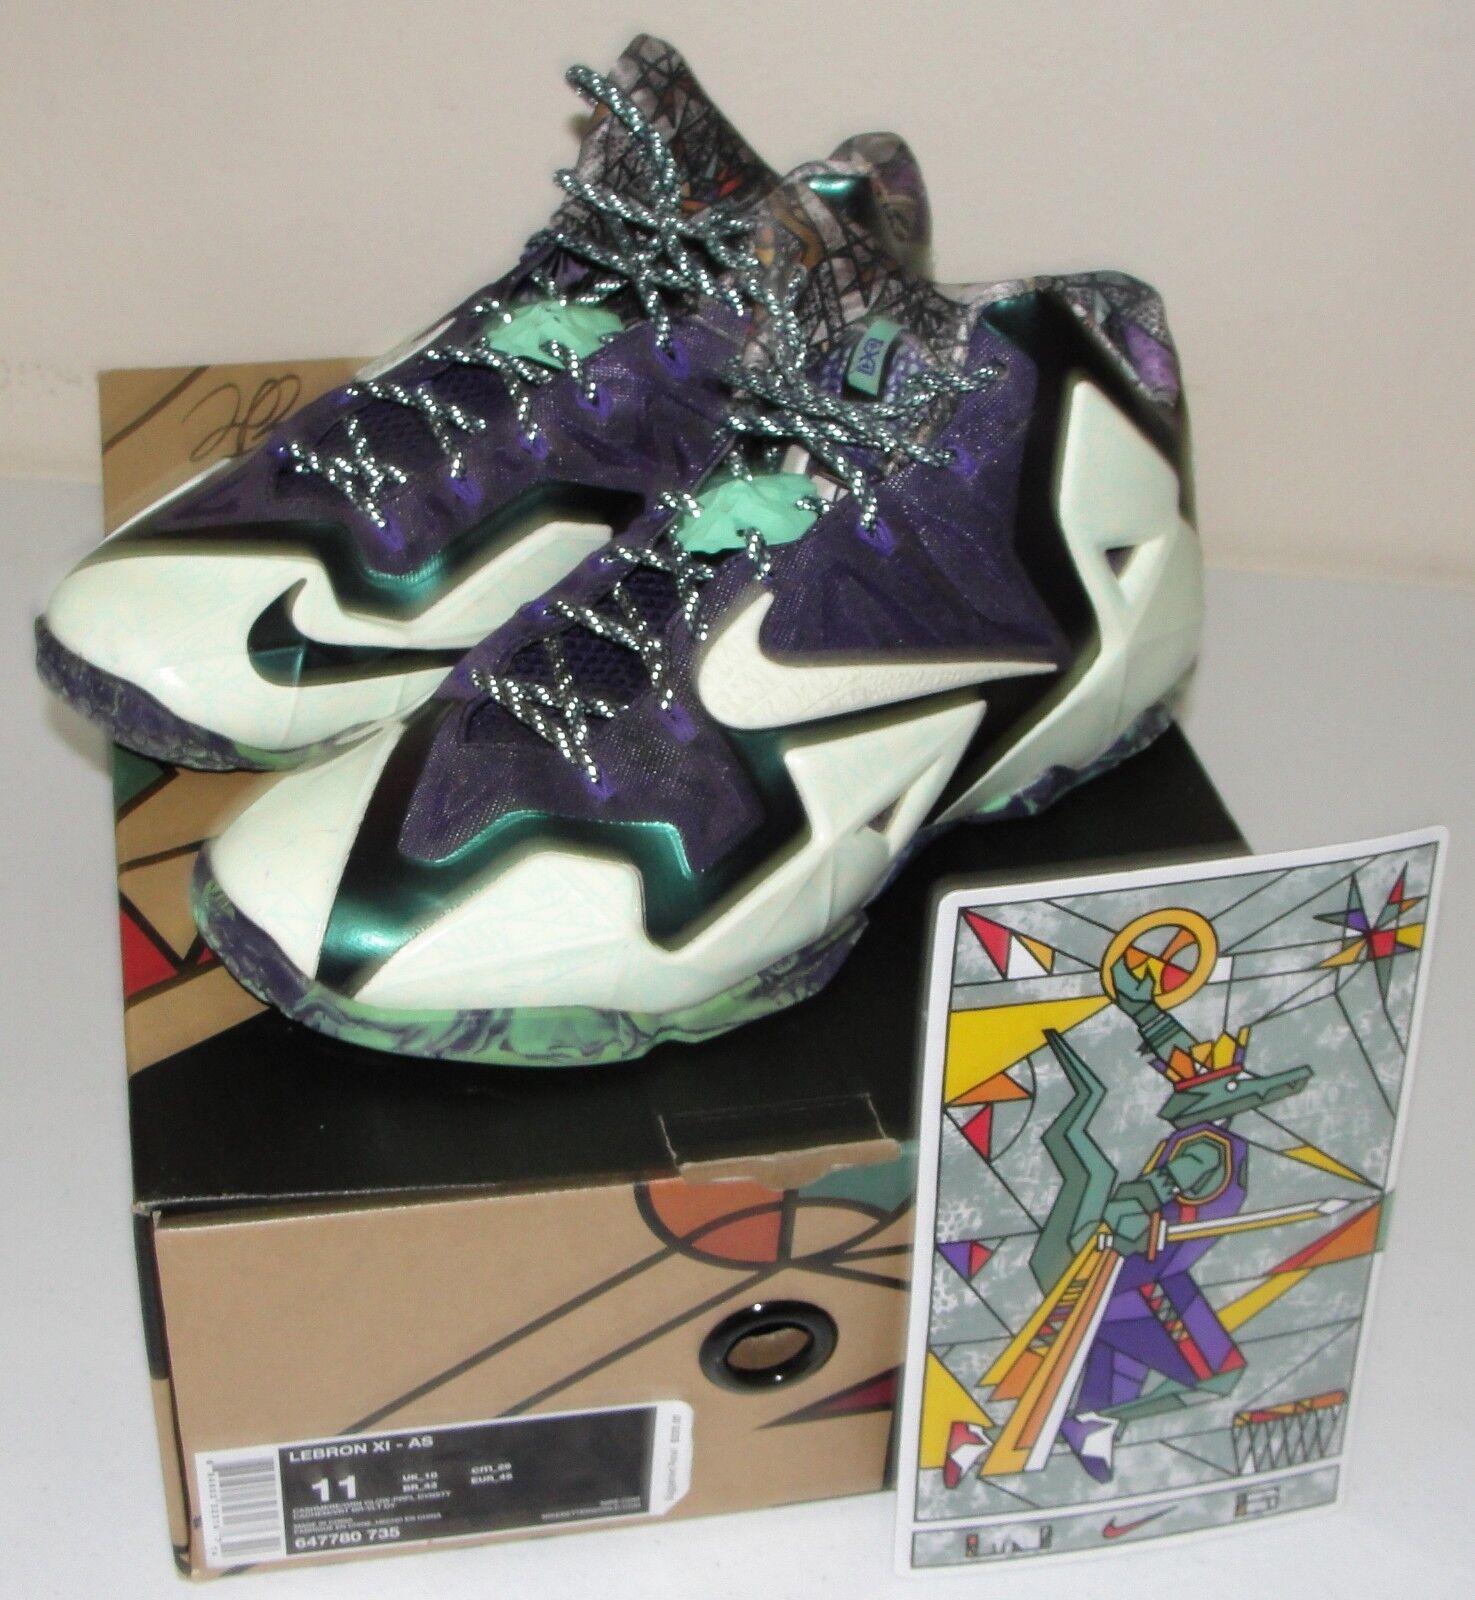 Nike lebron xi all star game gator re - 44 gumbo league